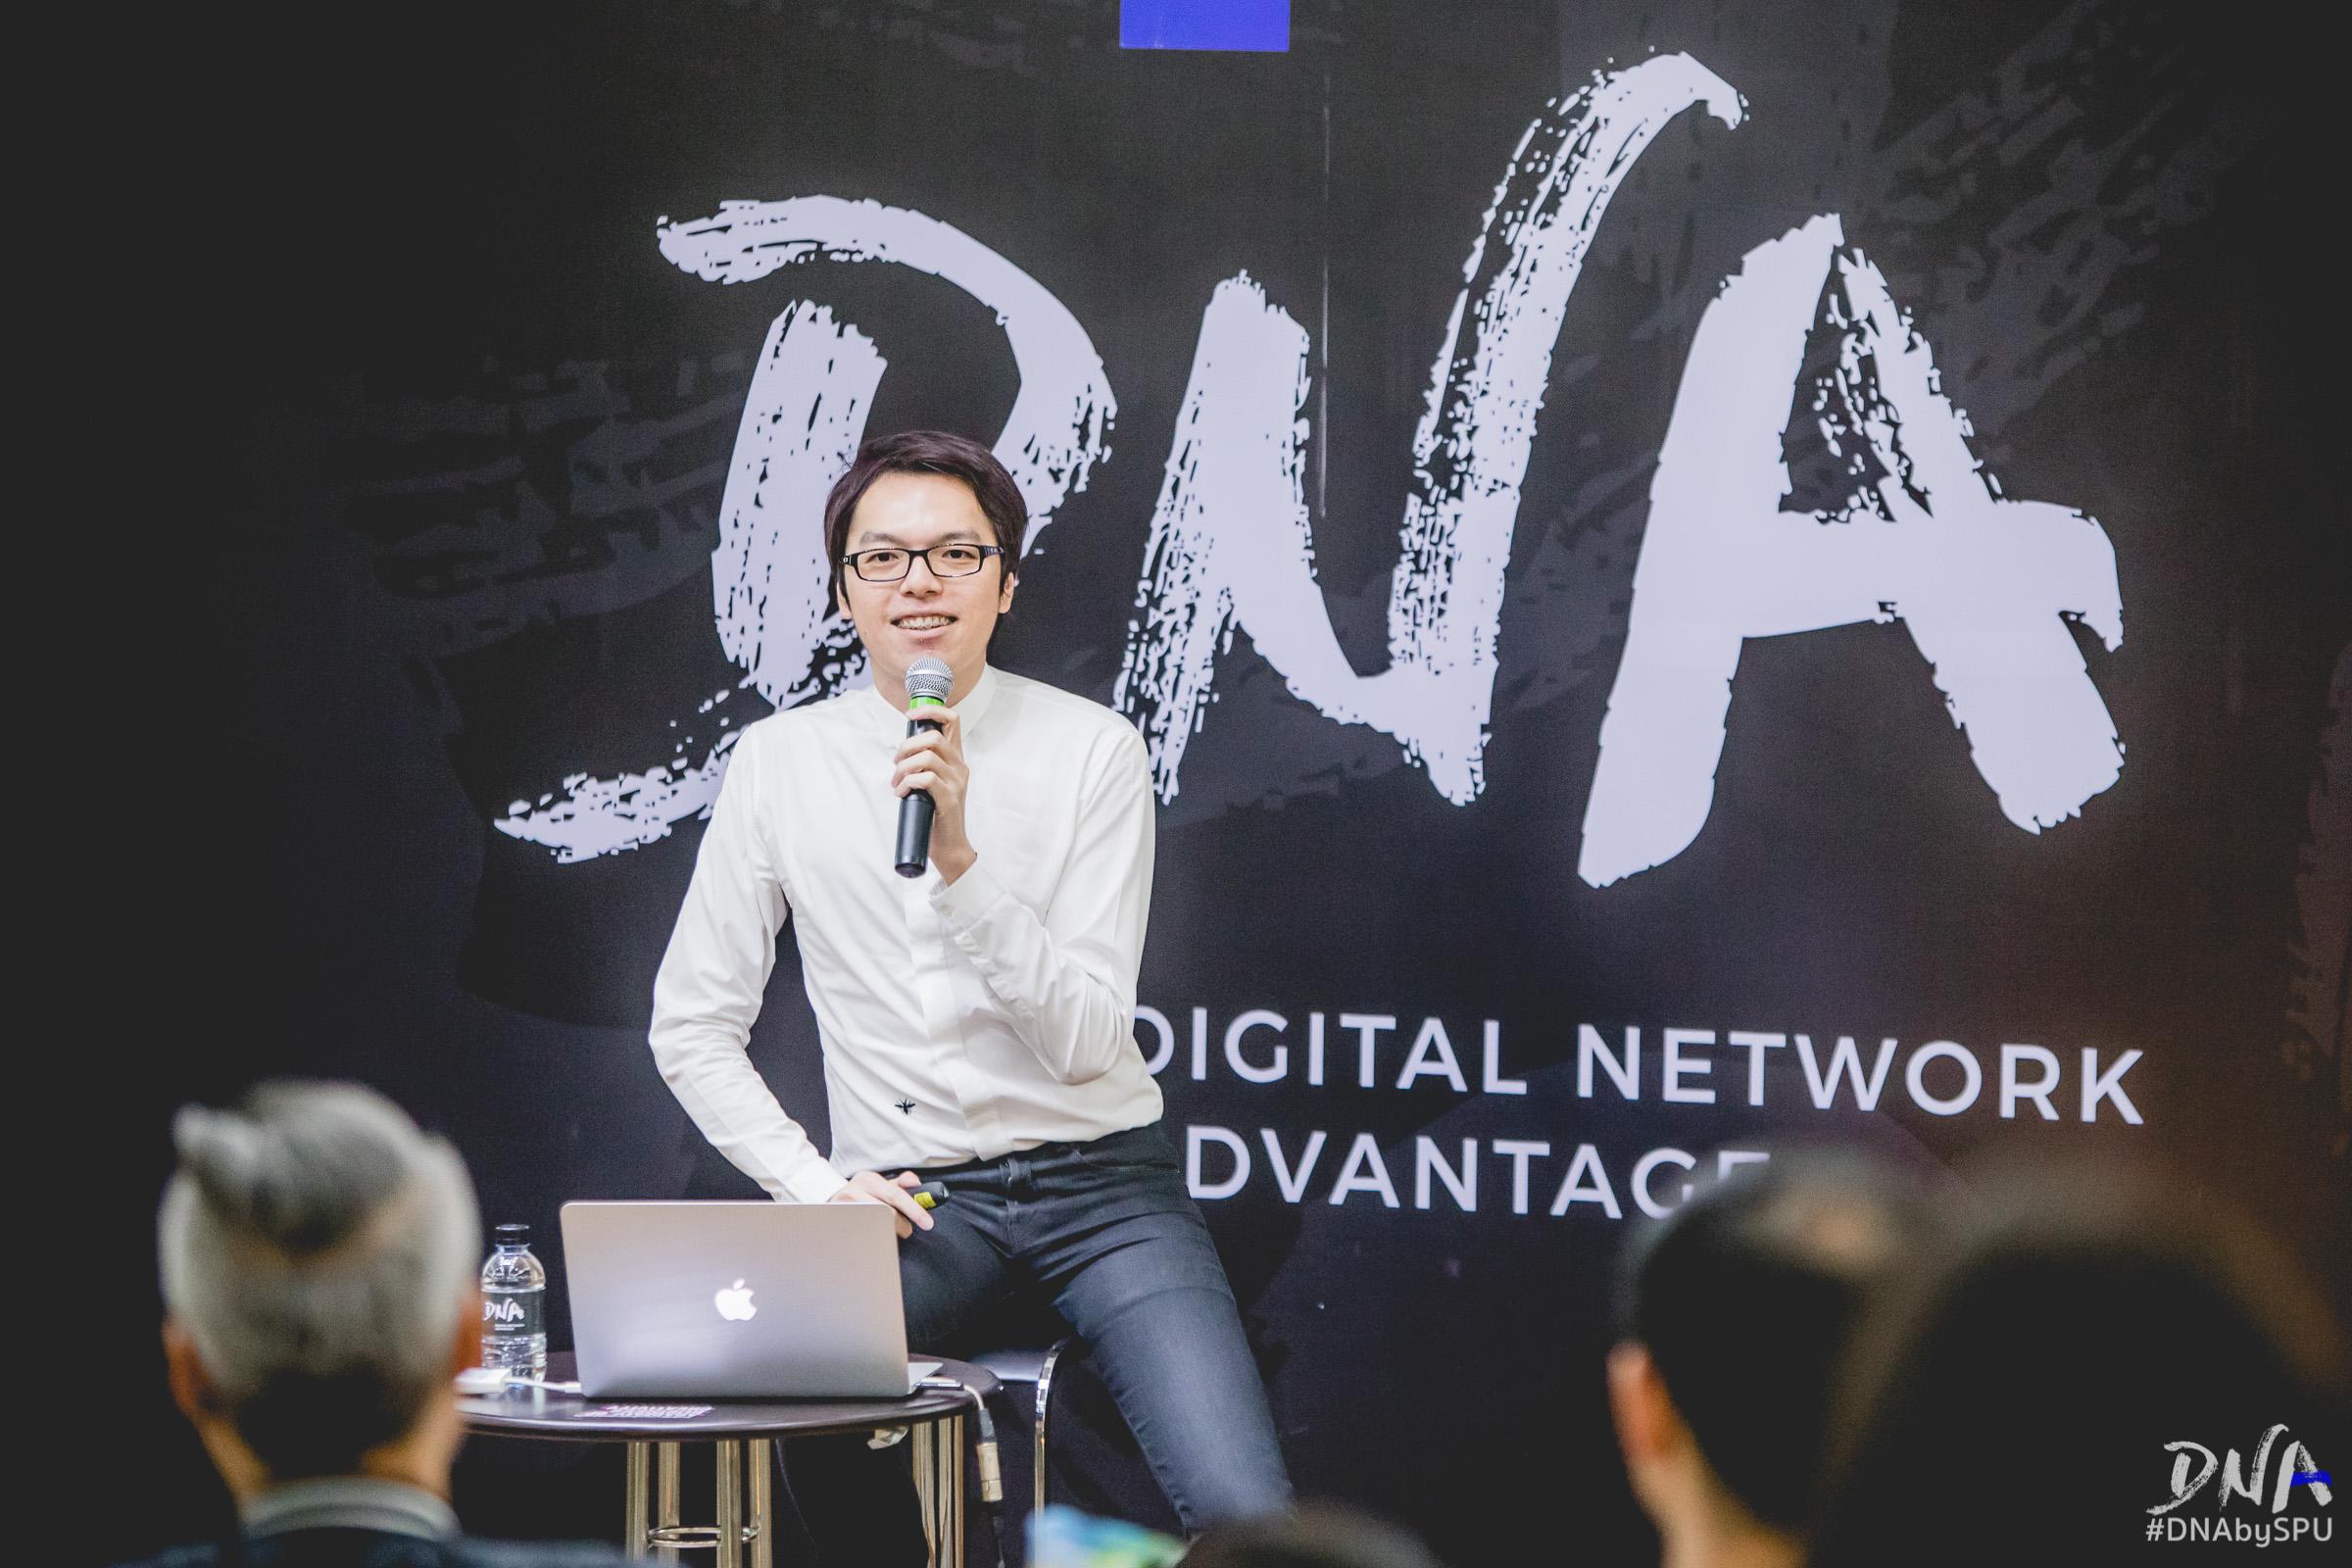 #DNAjournal EP.19 #DNAbySPU [Simplify complexity :: เปลี่ยนสิ่งยุ่งยาก… ให้เข้าใจง่าย] ดร.ยุทธนา ศรีสวัสดิ์ Co-founder and Tax Specialist, iTAX Thailand